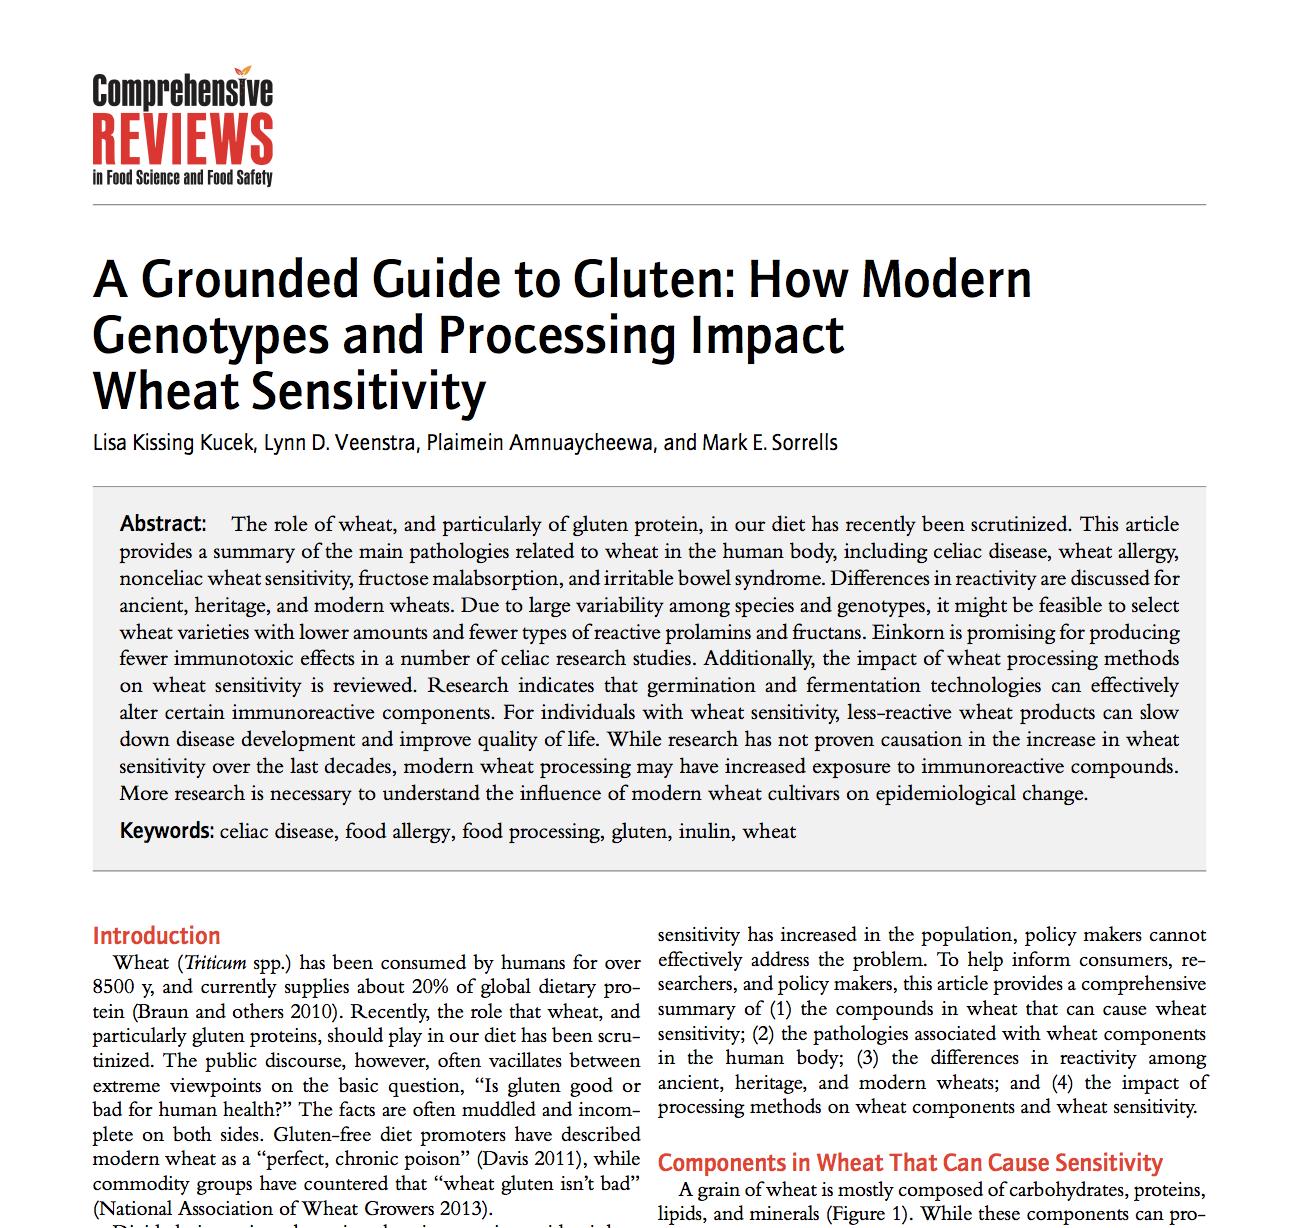 Sourdough fermentation reduced gluten toxicity